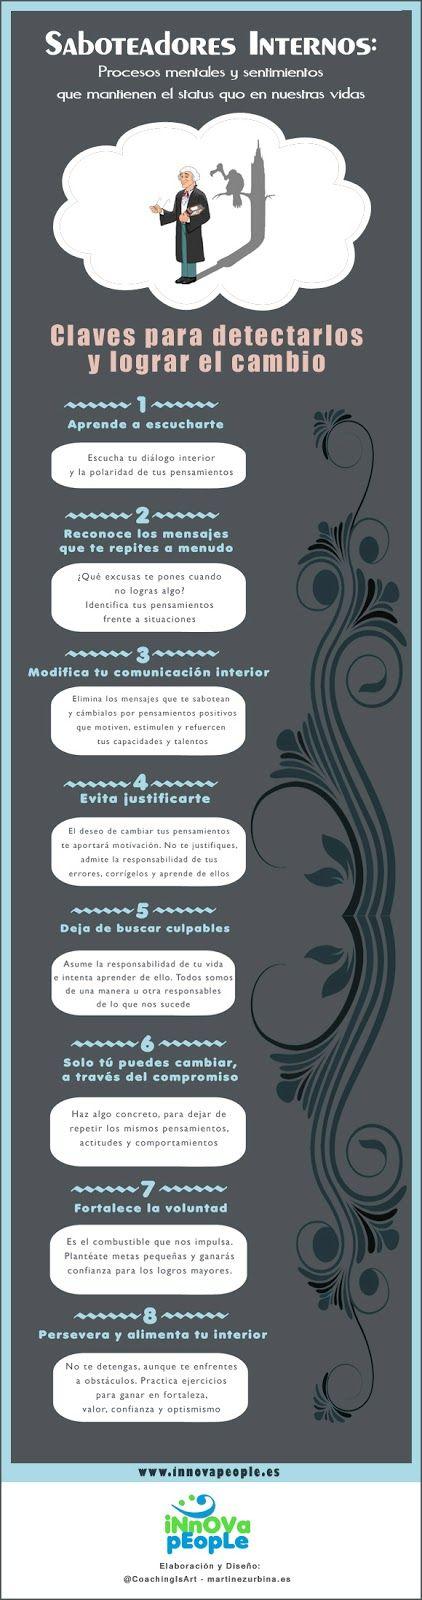 Saboteadores internos #infografia #infographic #psychology vía http://www.martinezurbina.es